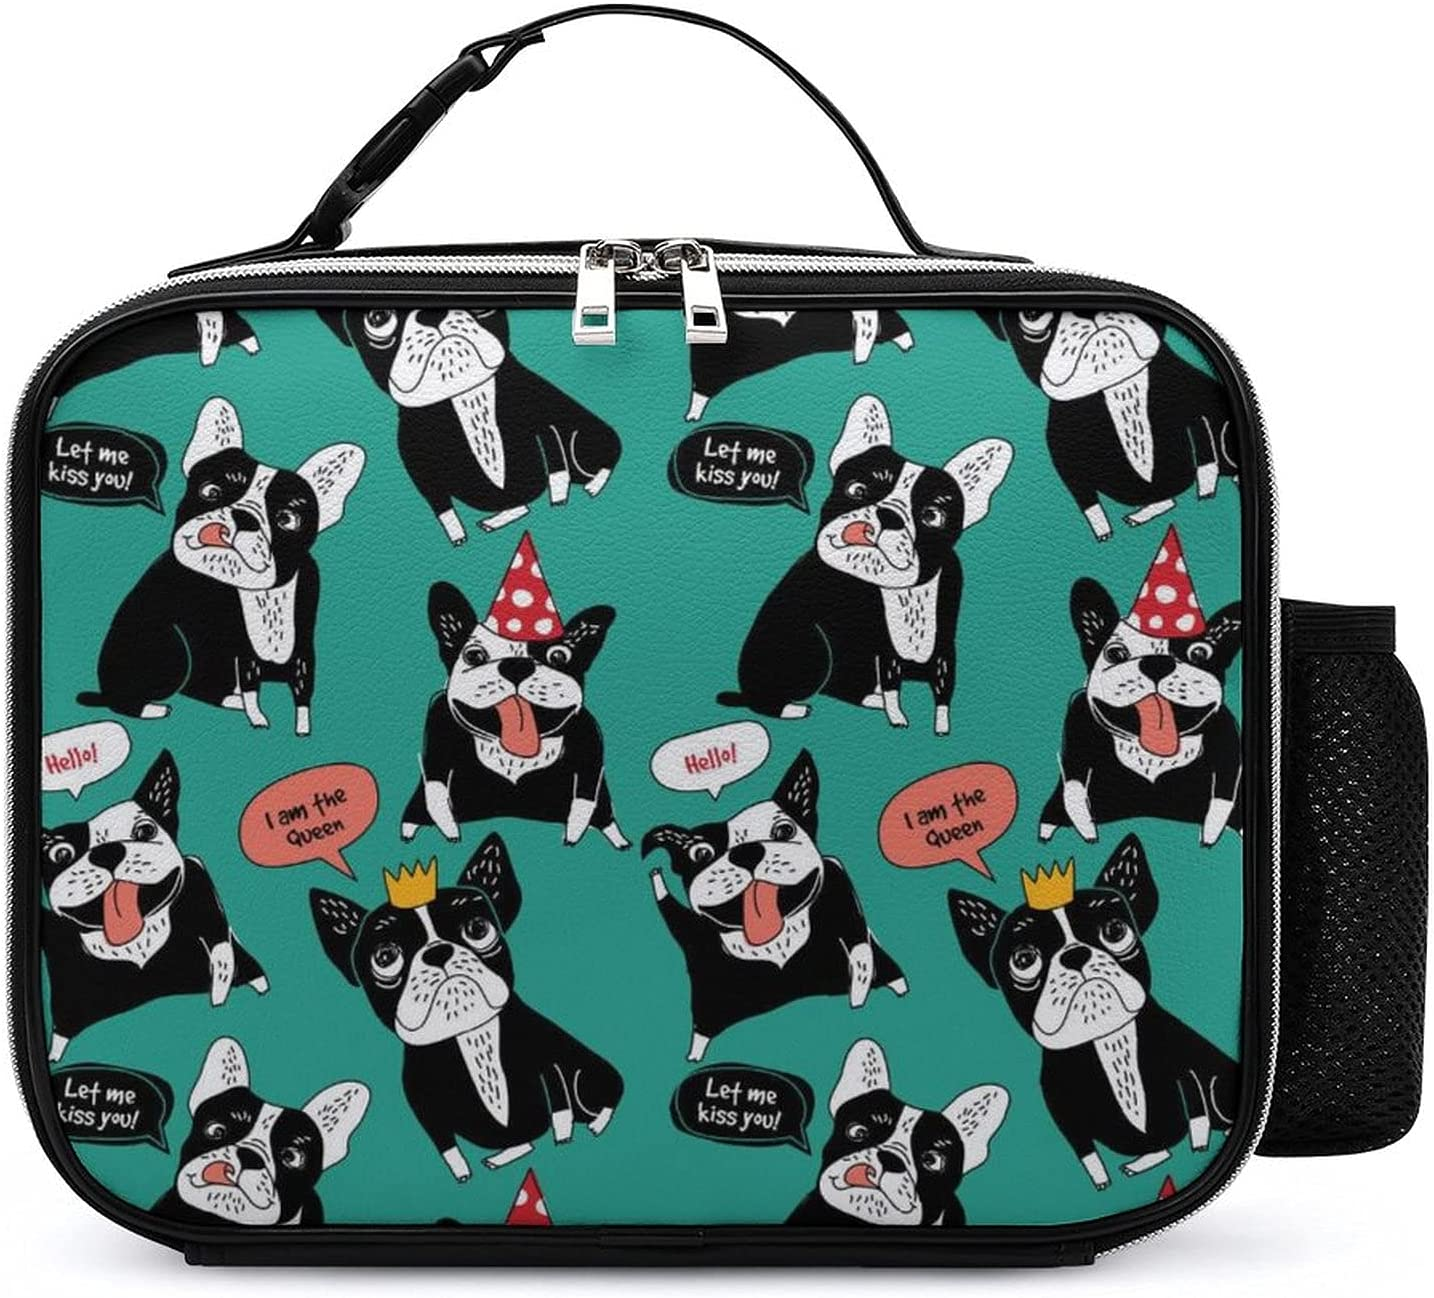 Latest item Happy French El Paso Mall Bulldog Lunch Bag Leather Detachable Box Mea Handle